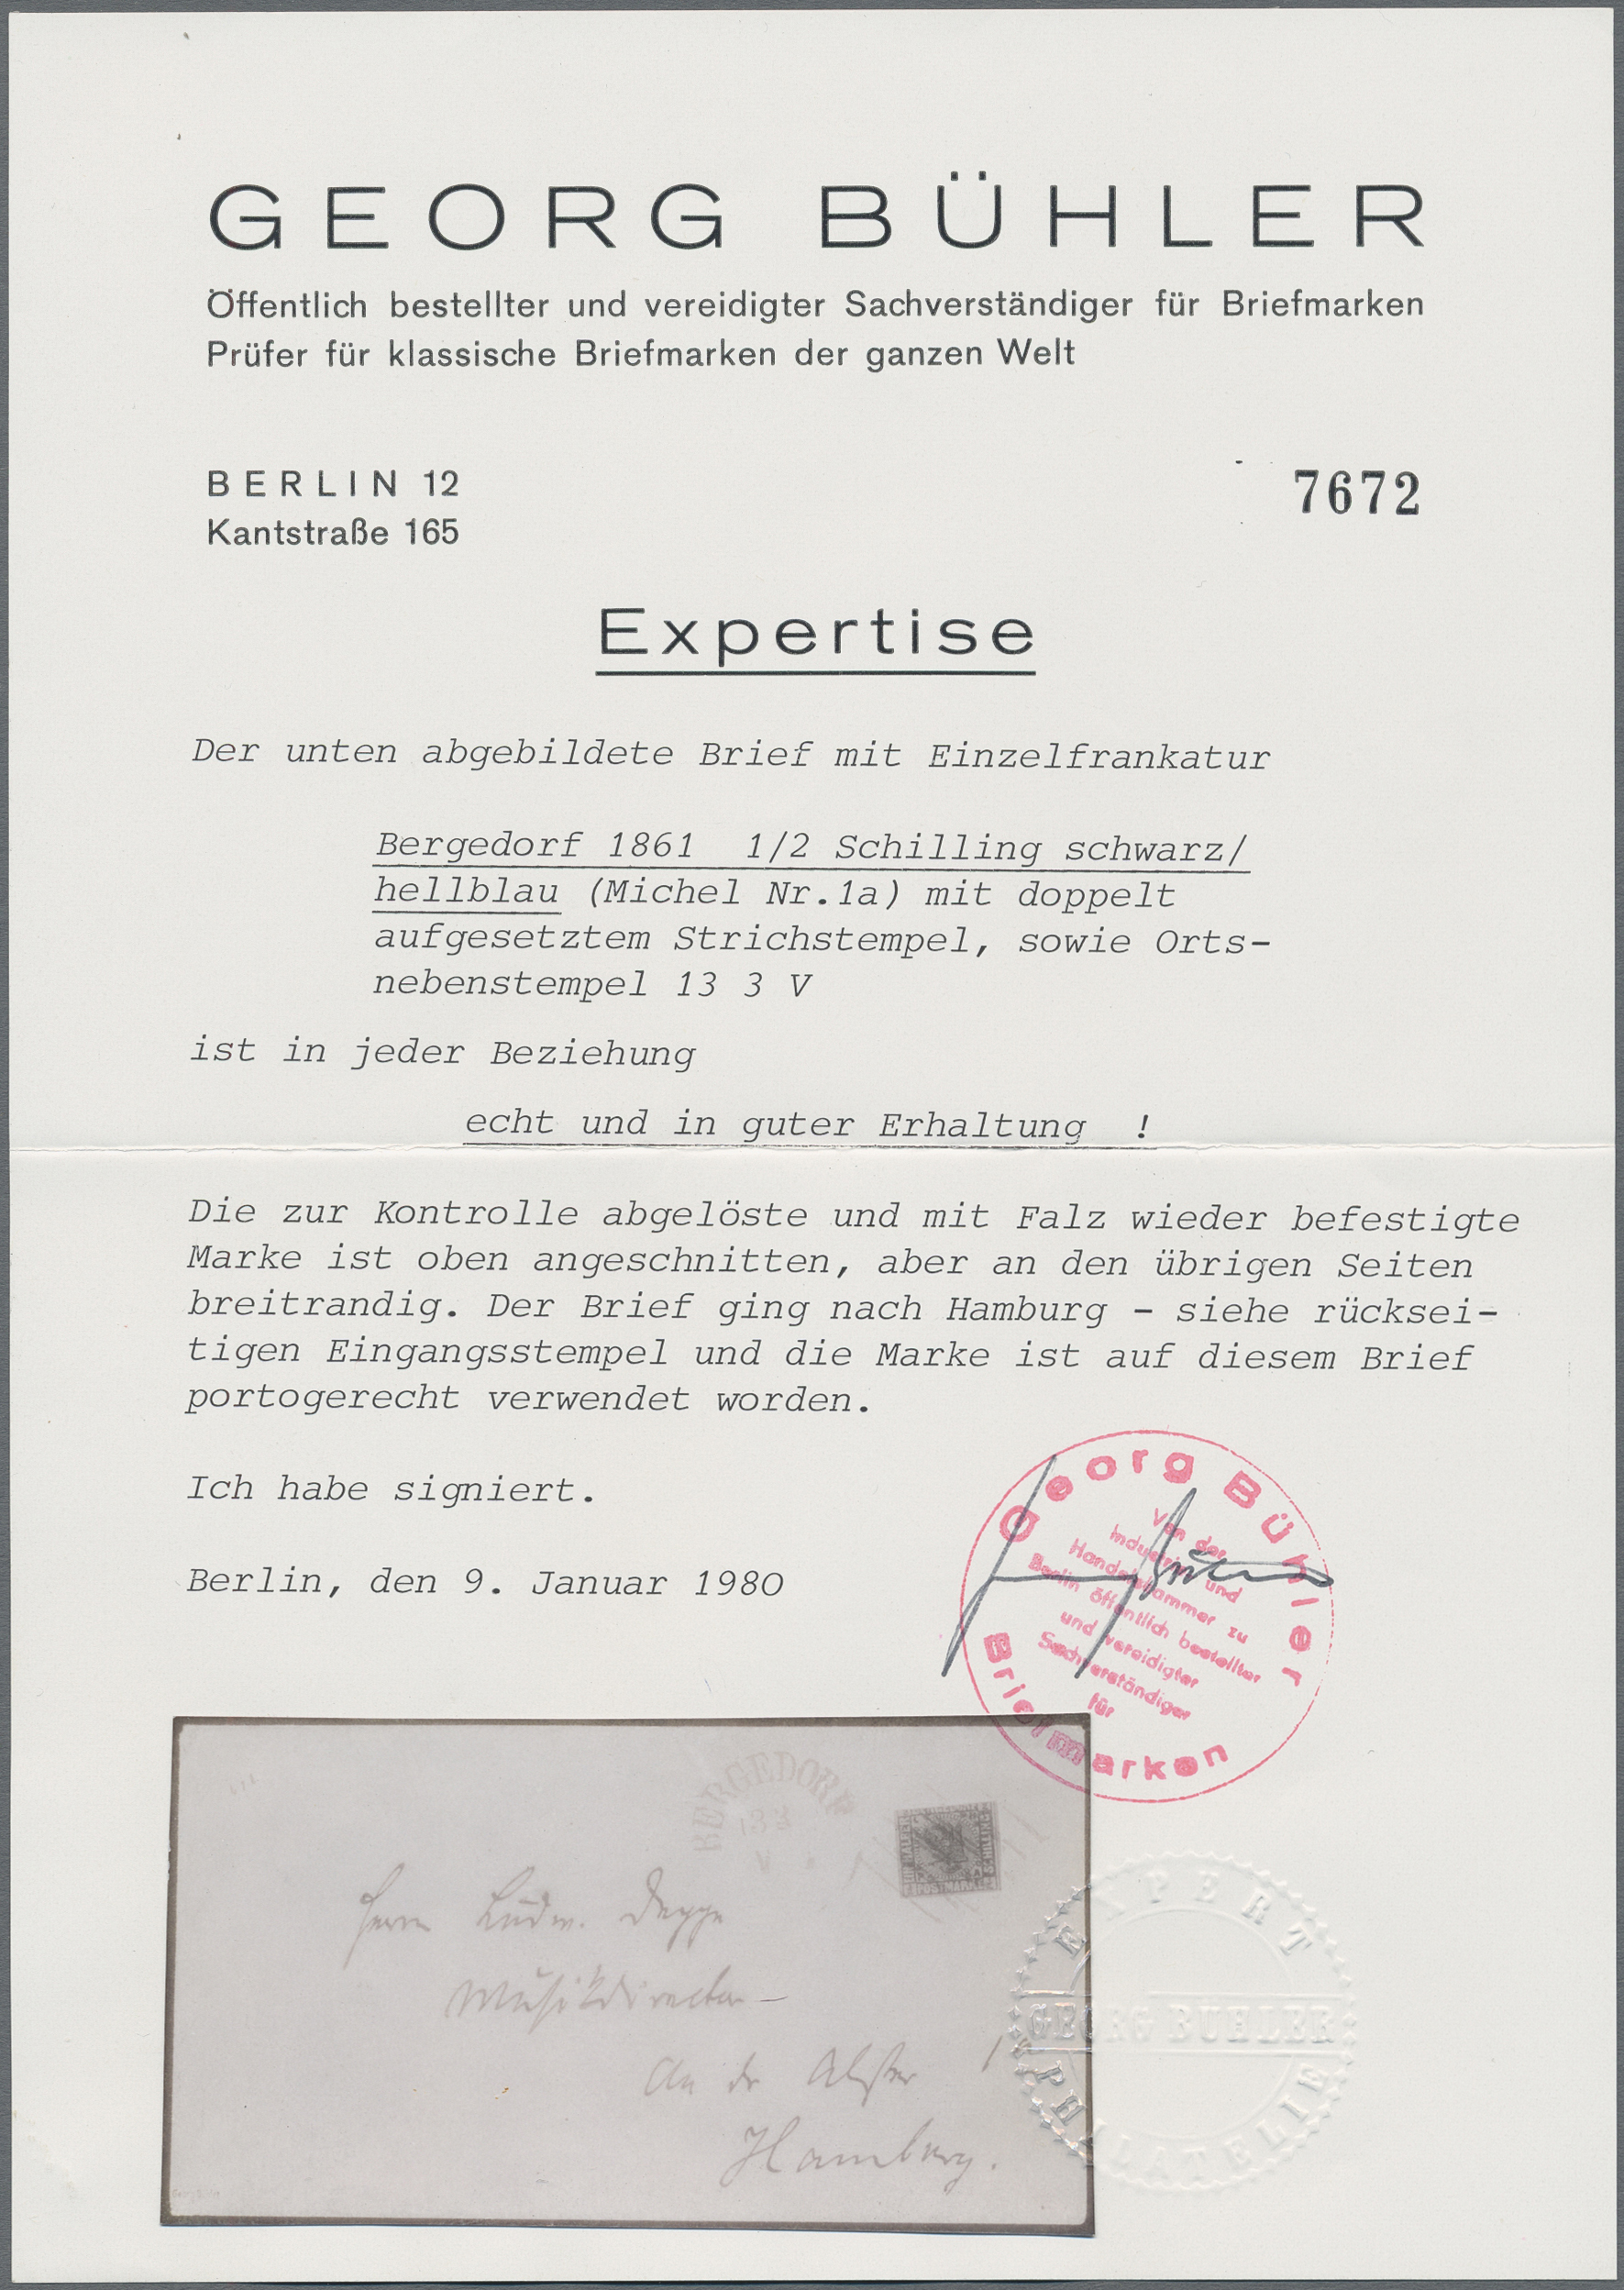 Lot 20258 - Bergedorf - Marken und Briefe  -  Auktionshaus Christoph Gärtner GmbH & Co. KG Sale #44 Germany, Picture Post cards